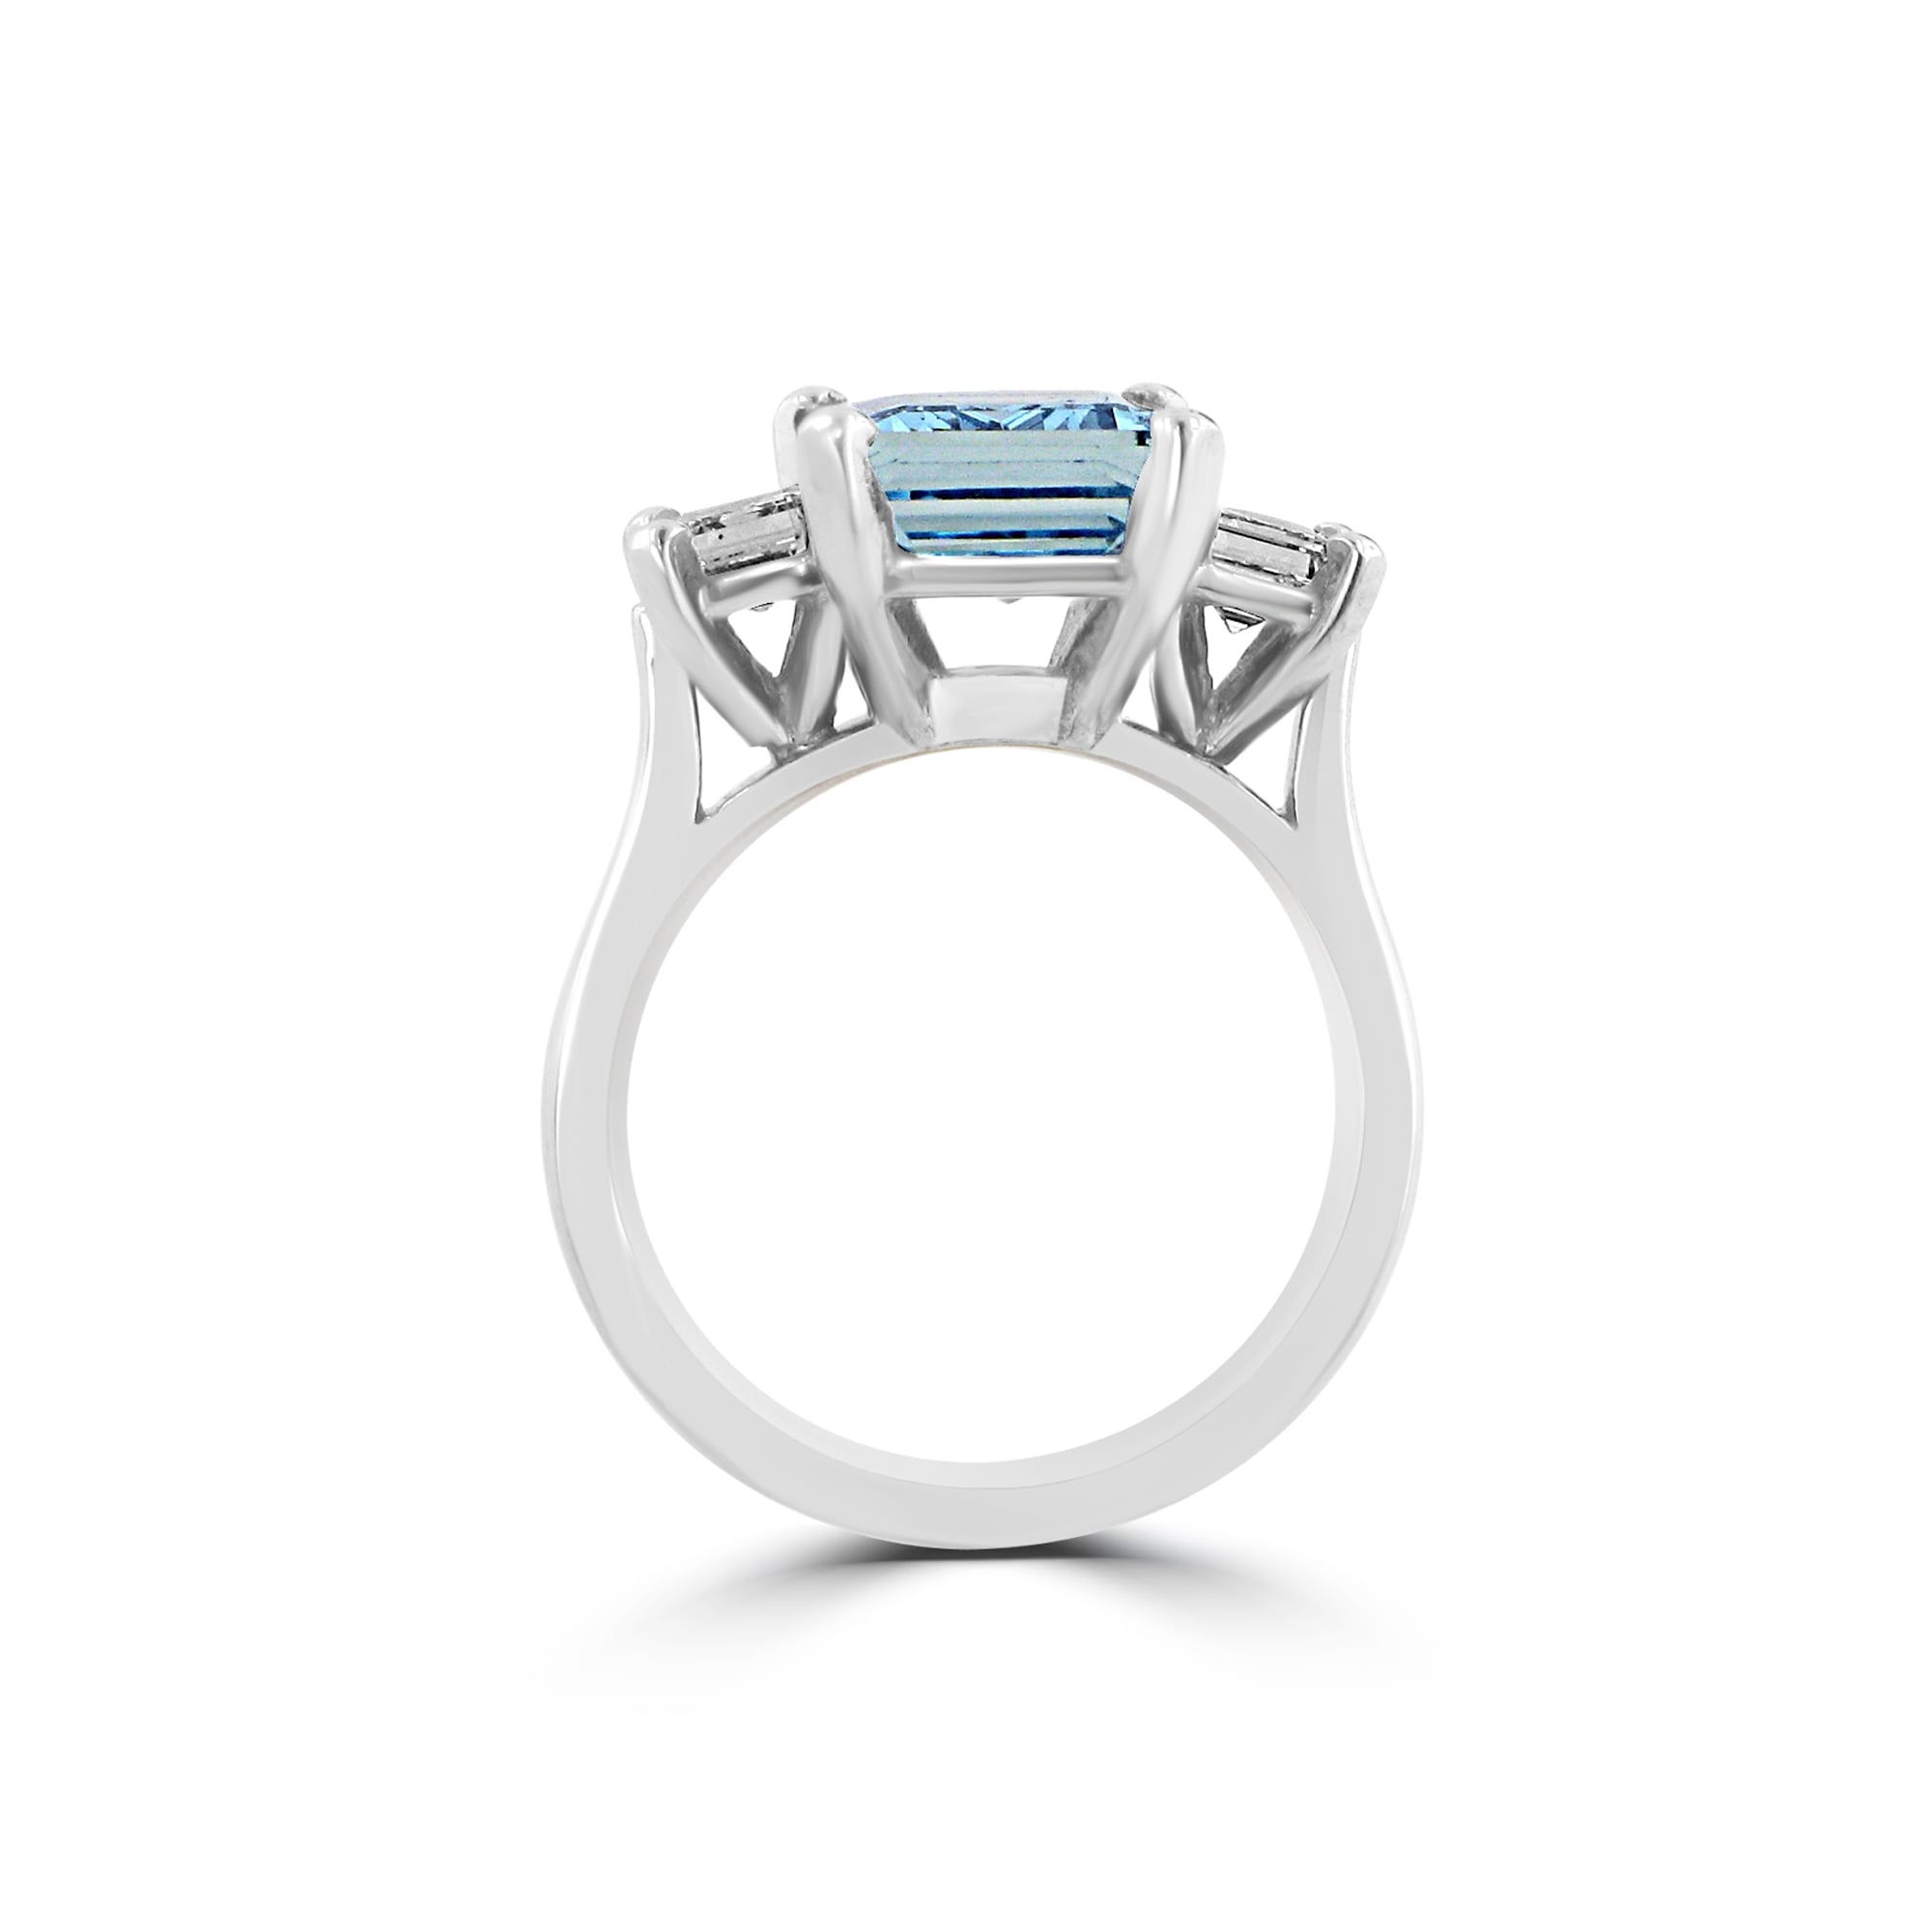 2979d97d9983b Three Carat Aquamarine and Diamond Three Stone Ring in 18ct White Gold  RWD36424